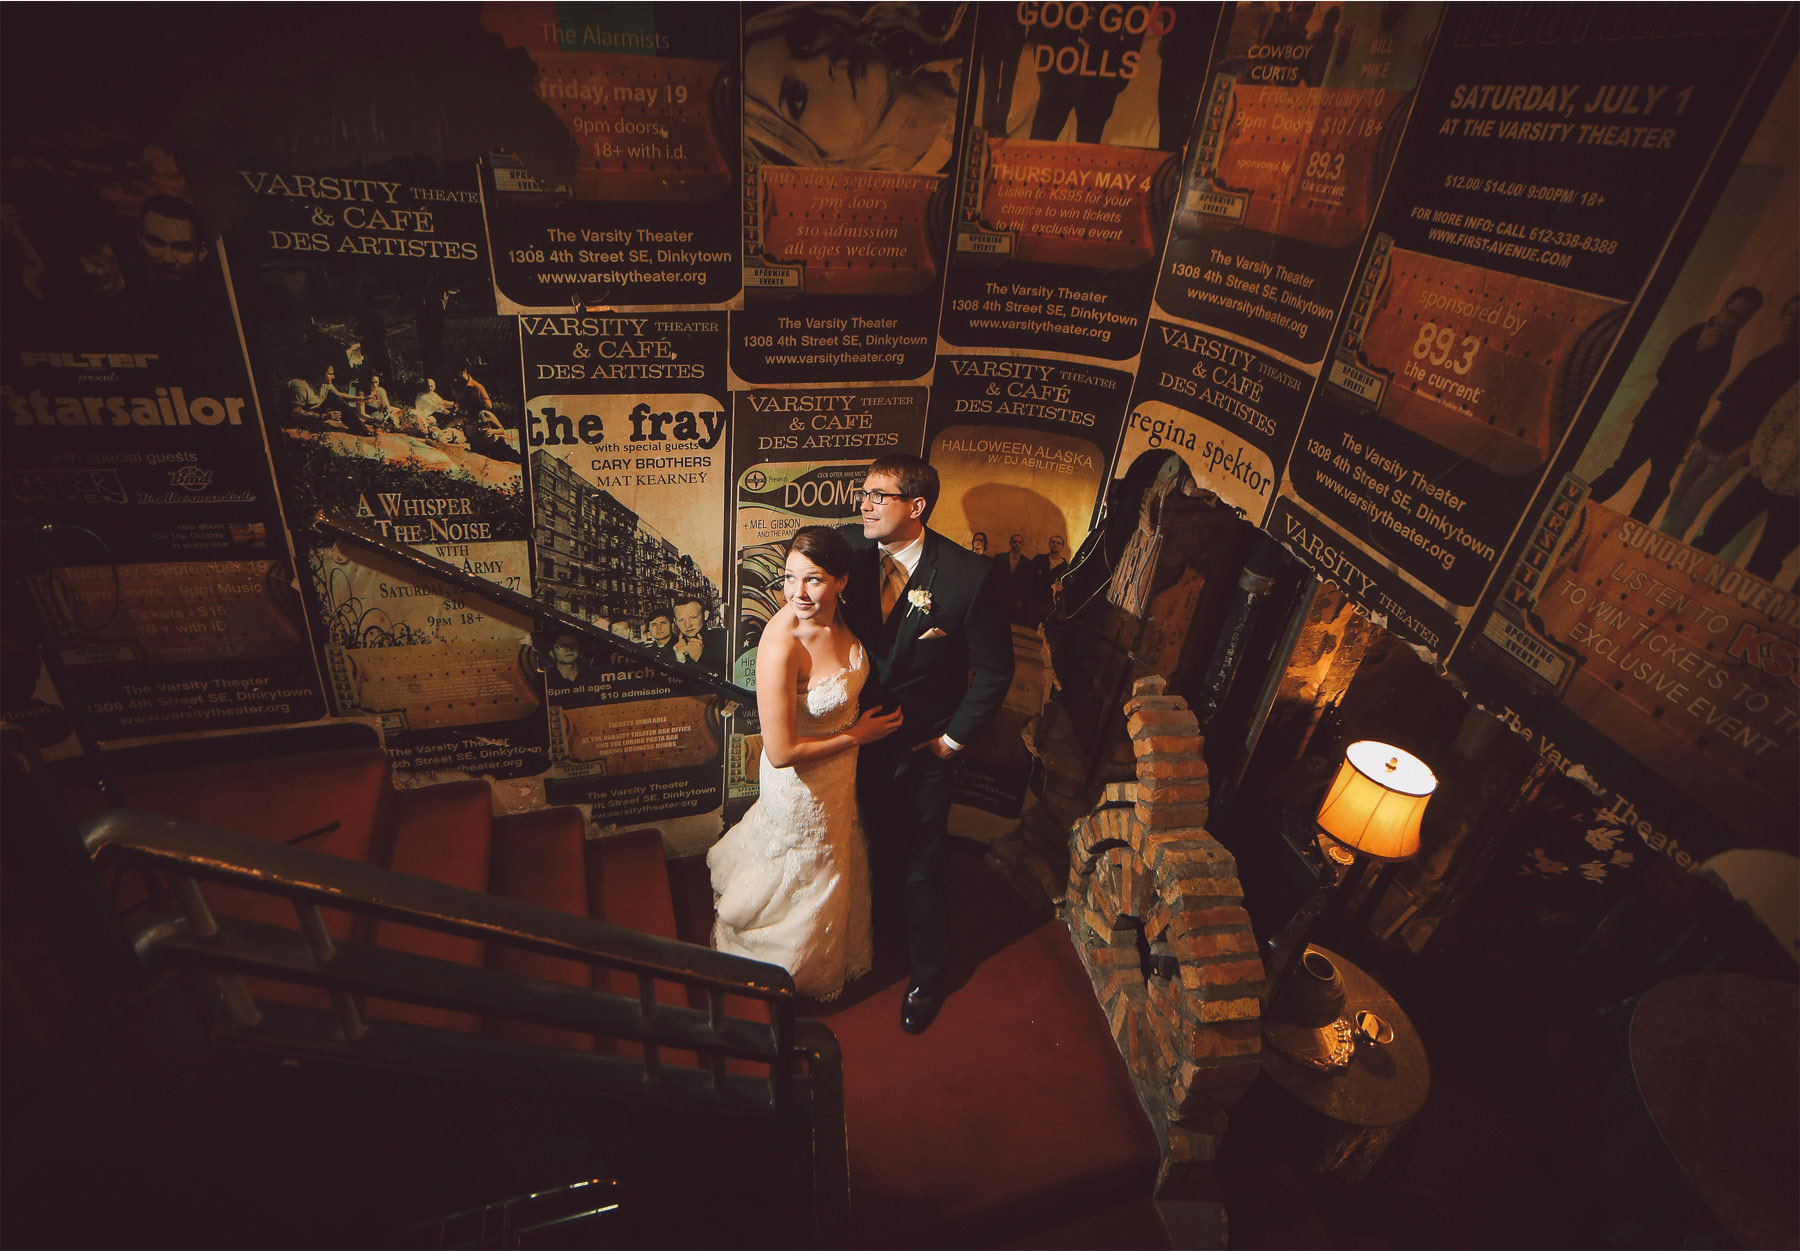 24-Minneapolis-Minnesota-Wedding-Photographer-by-Andrew-Vick-Photography-Winter-Varsity-Theater-Reception-Bride-Groom-Vintage-Sara-and-Rob.jpg